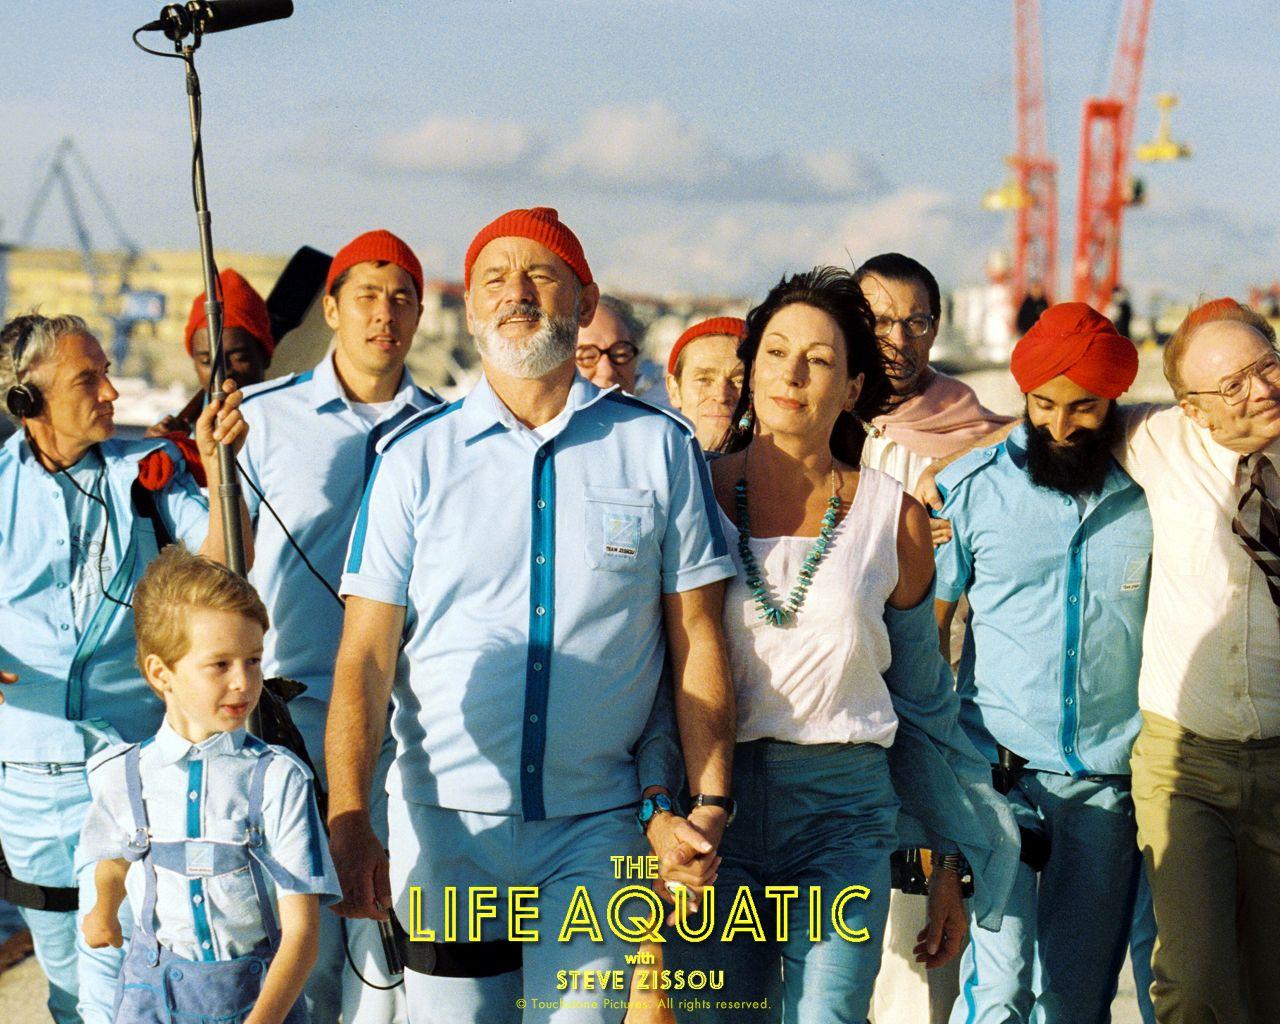 the life aquatic with steve zissou movie online